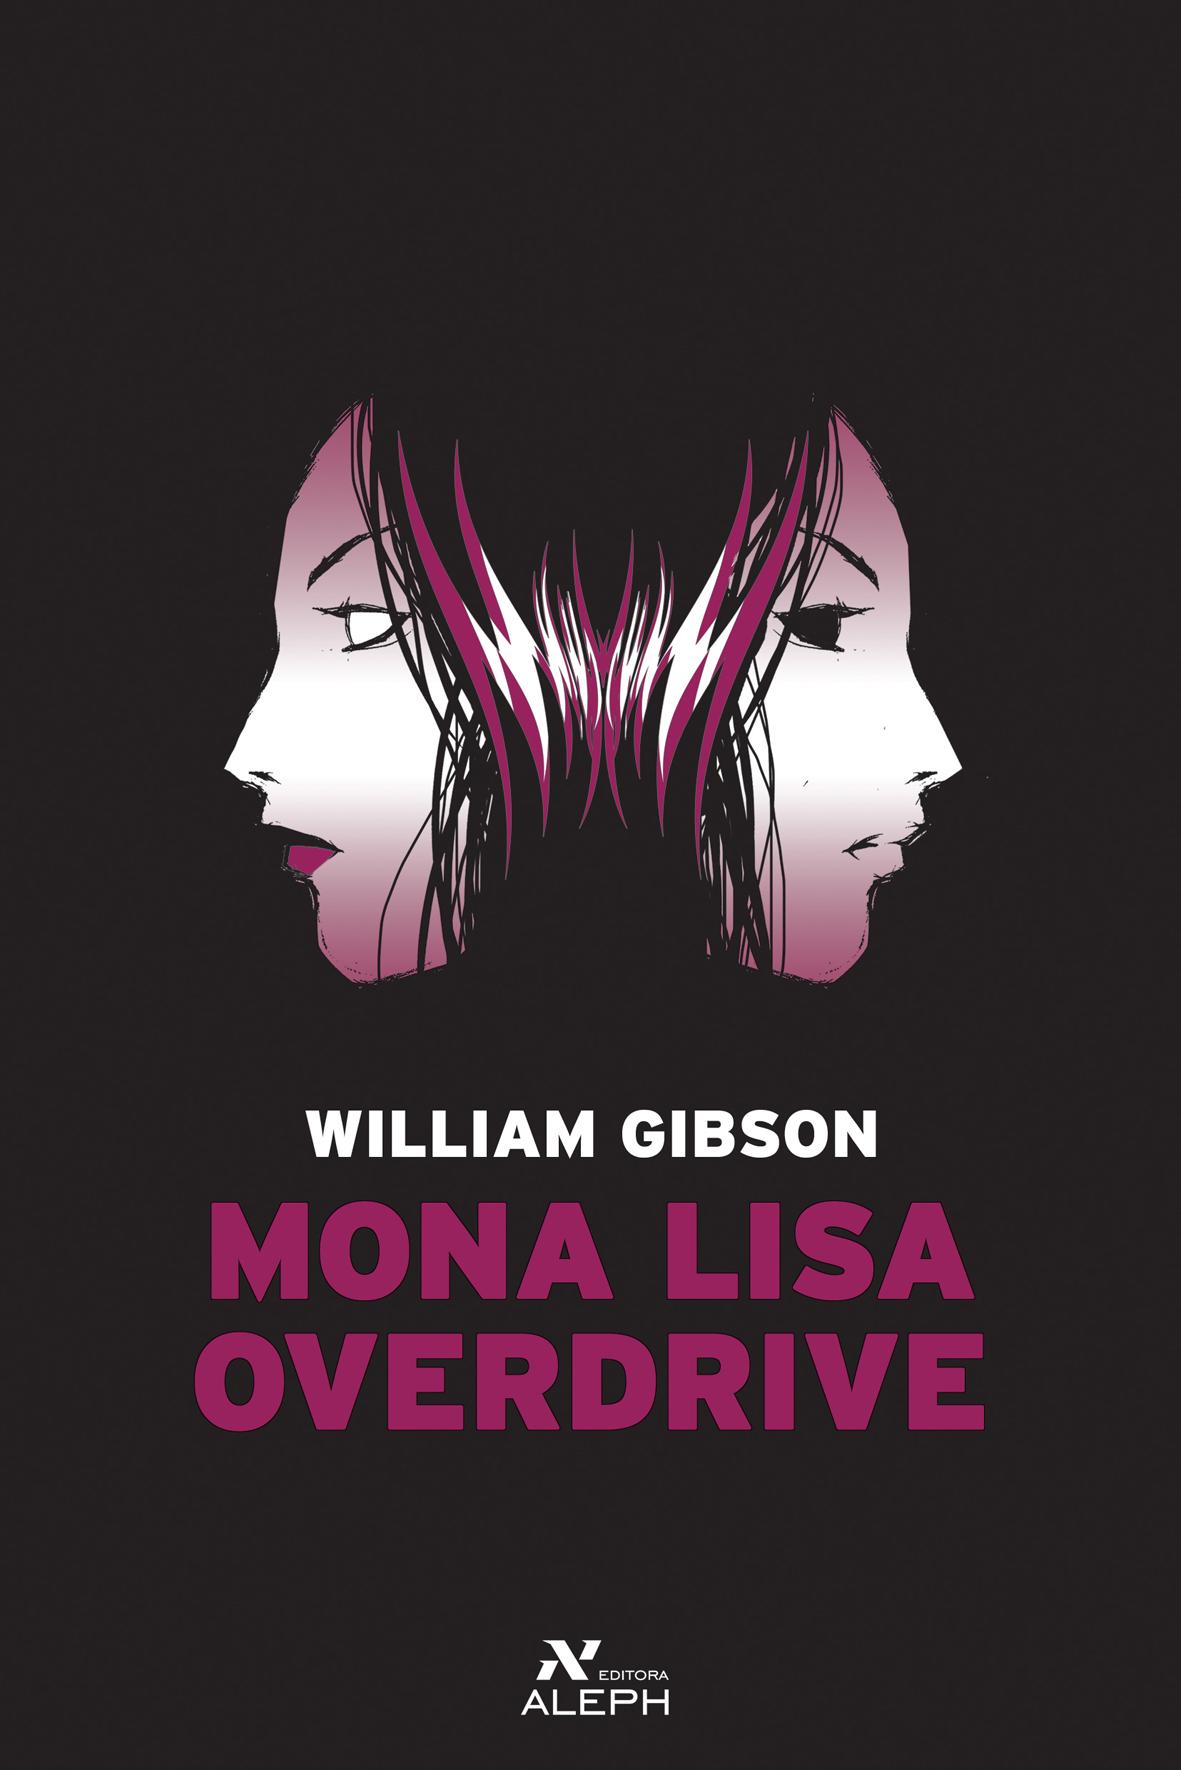 mona_lisa_overdrive_frente_alta